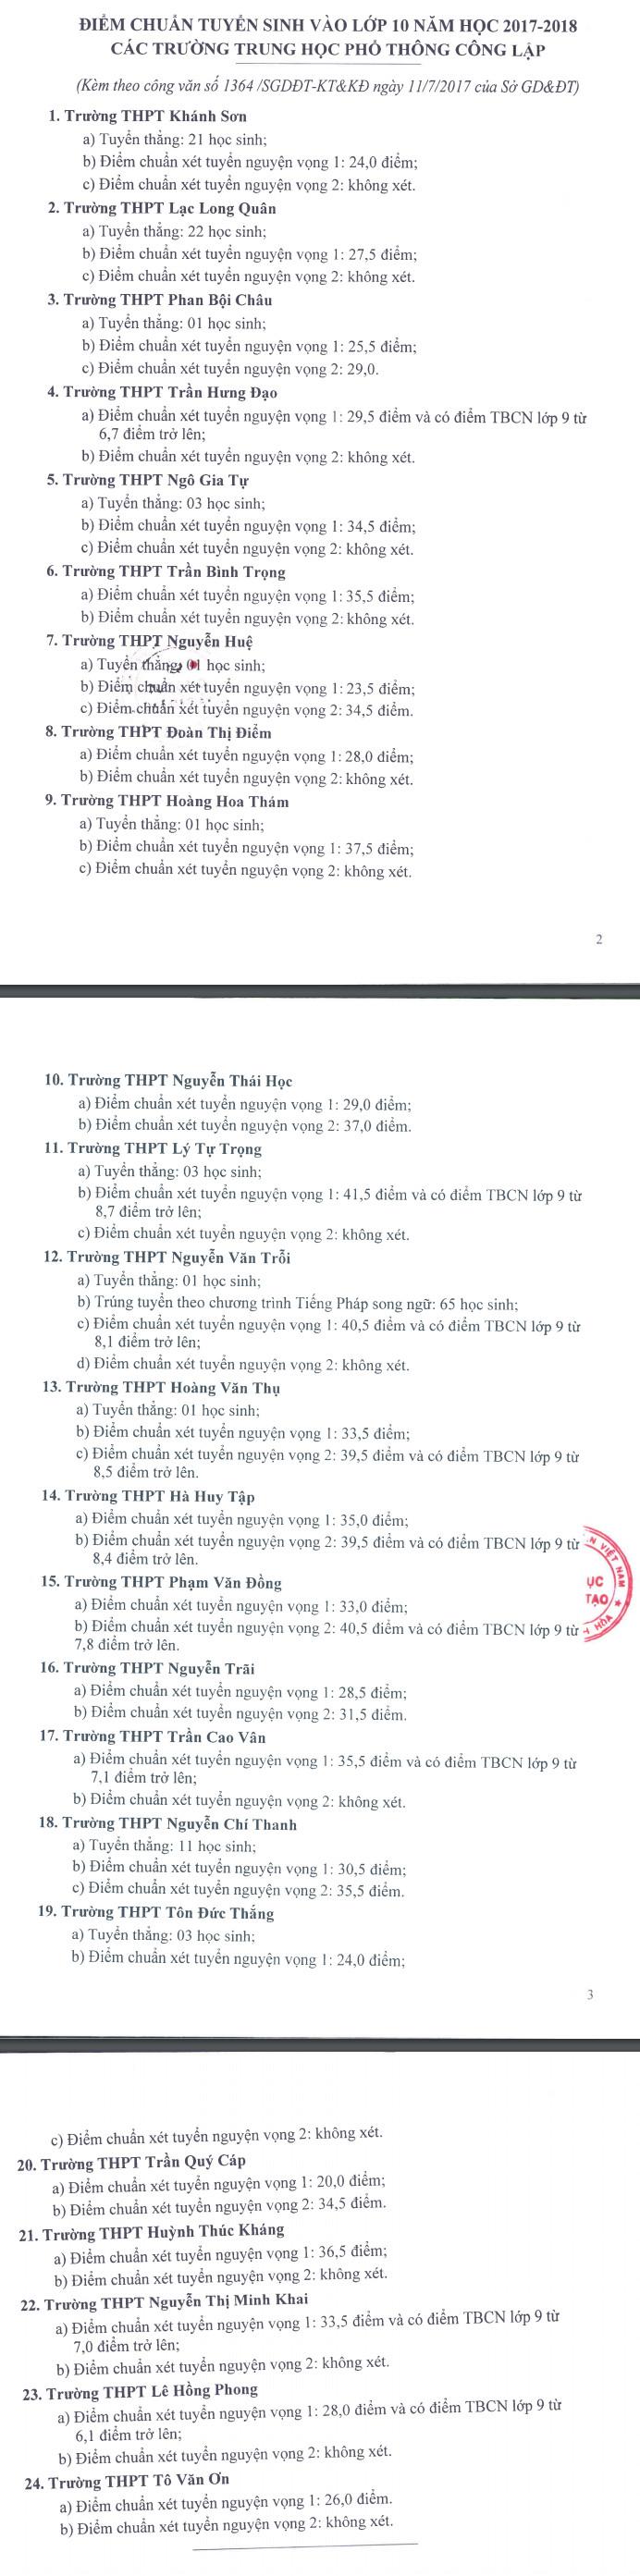 Diem chuan vao lop 10 THPT tinh Khanh Hoa 2017